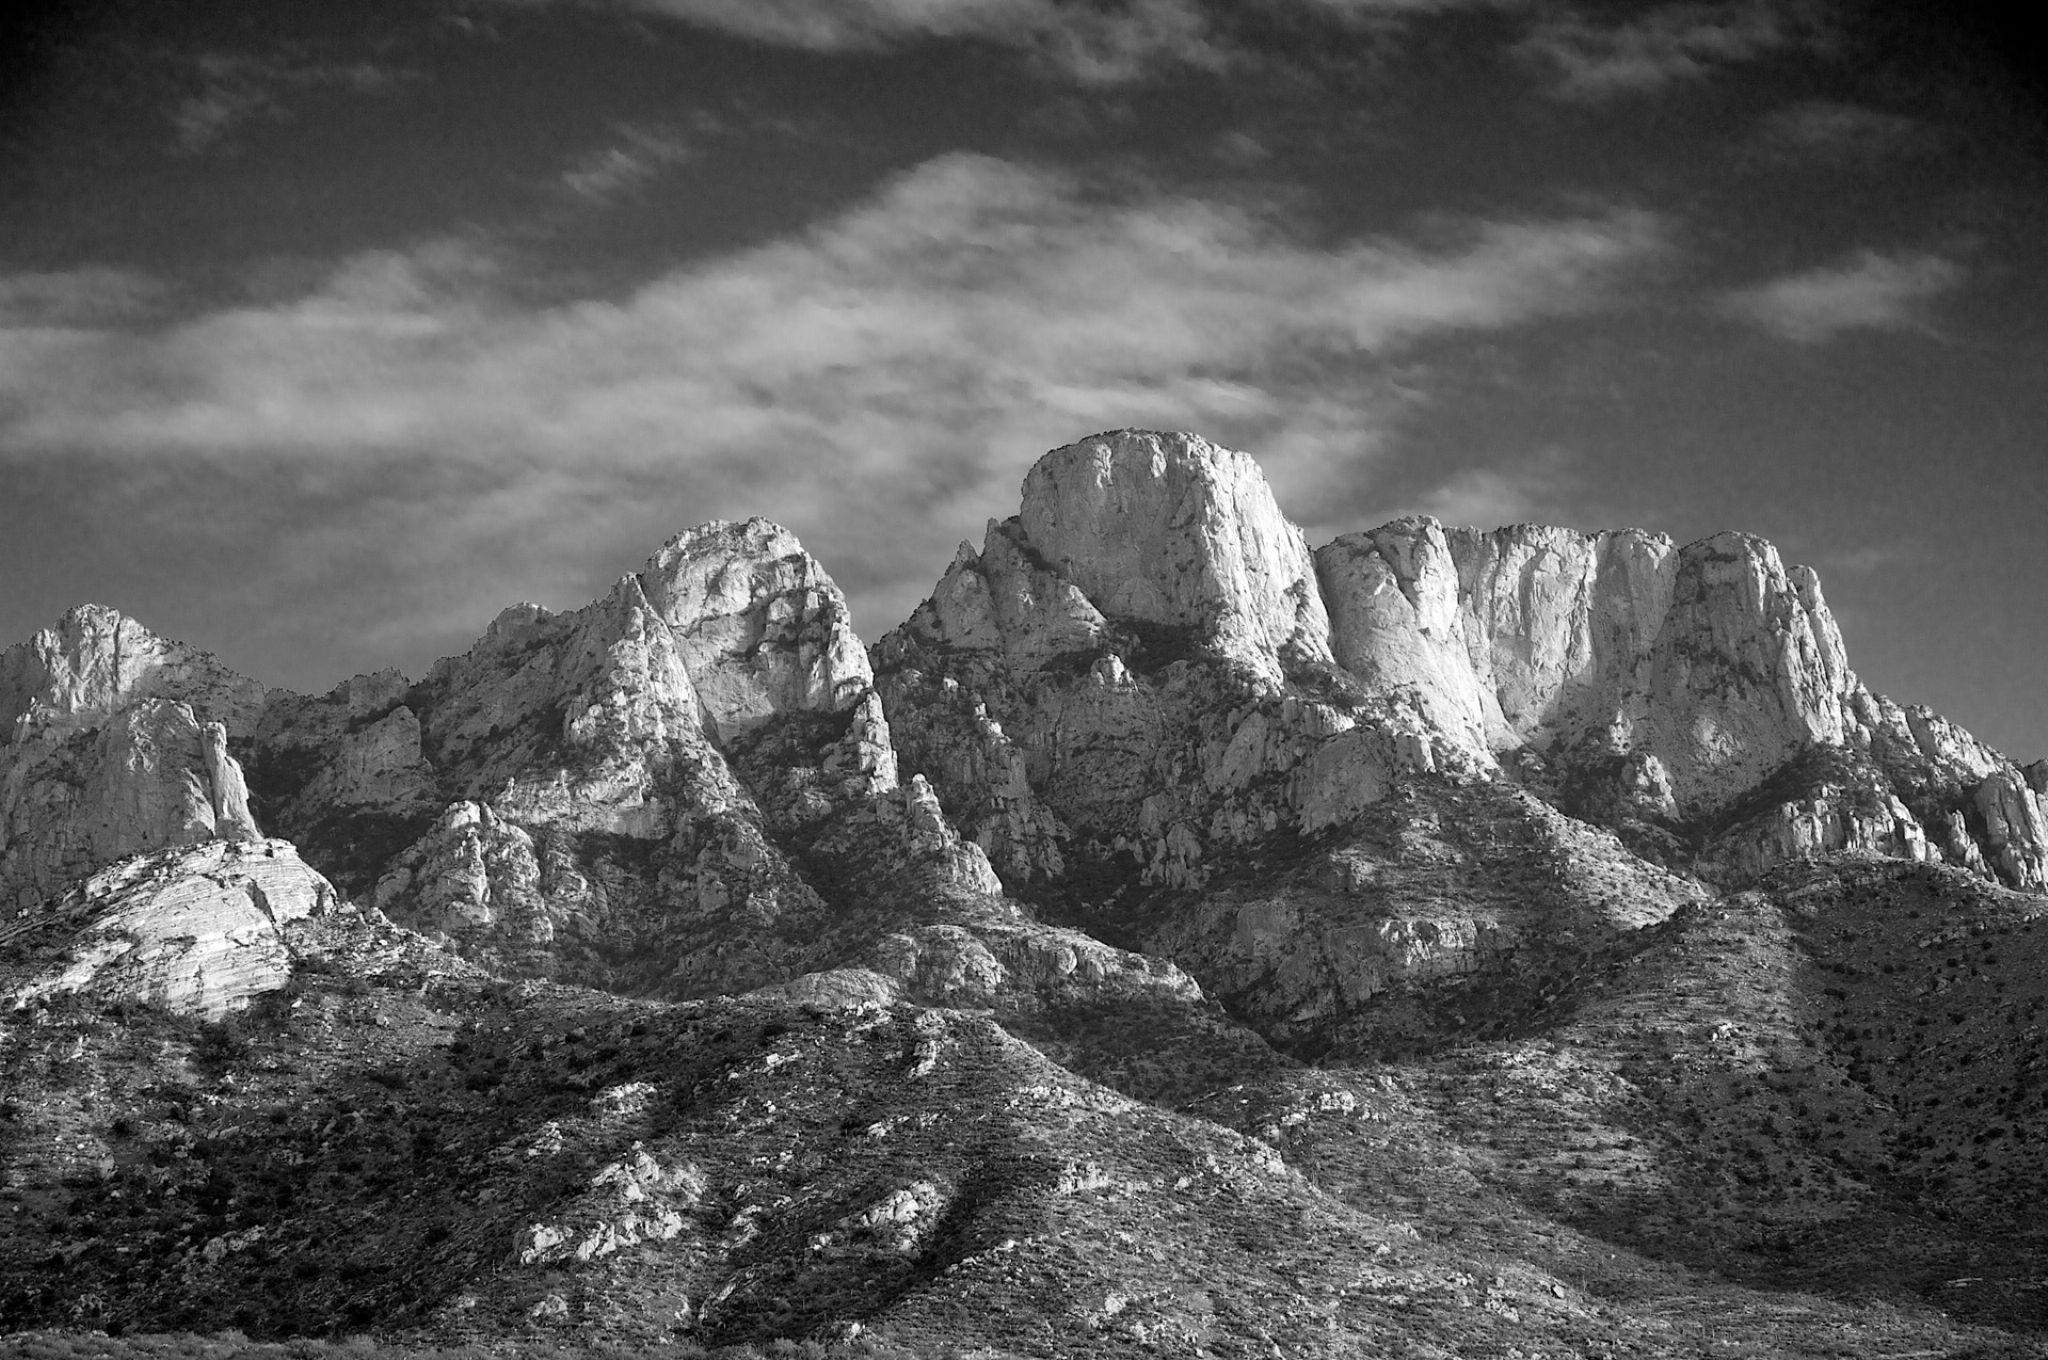 Catalina Mountains by Jim Lipschutz